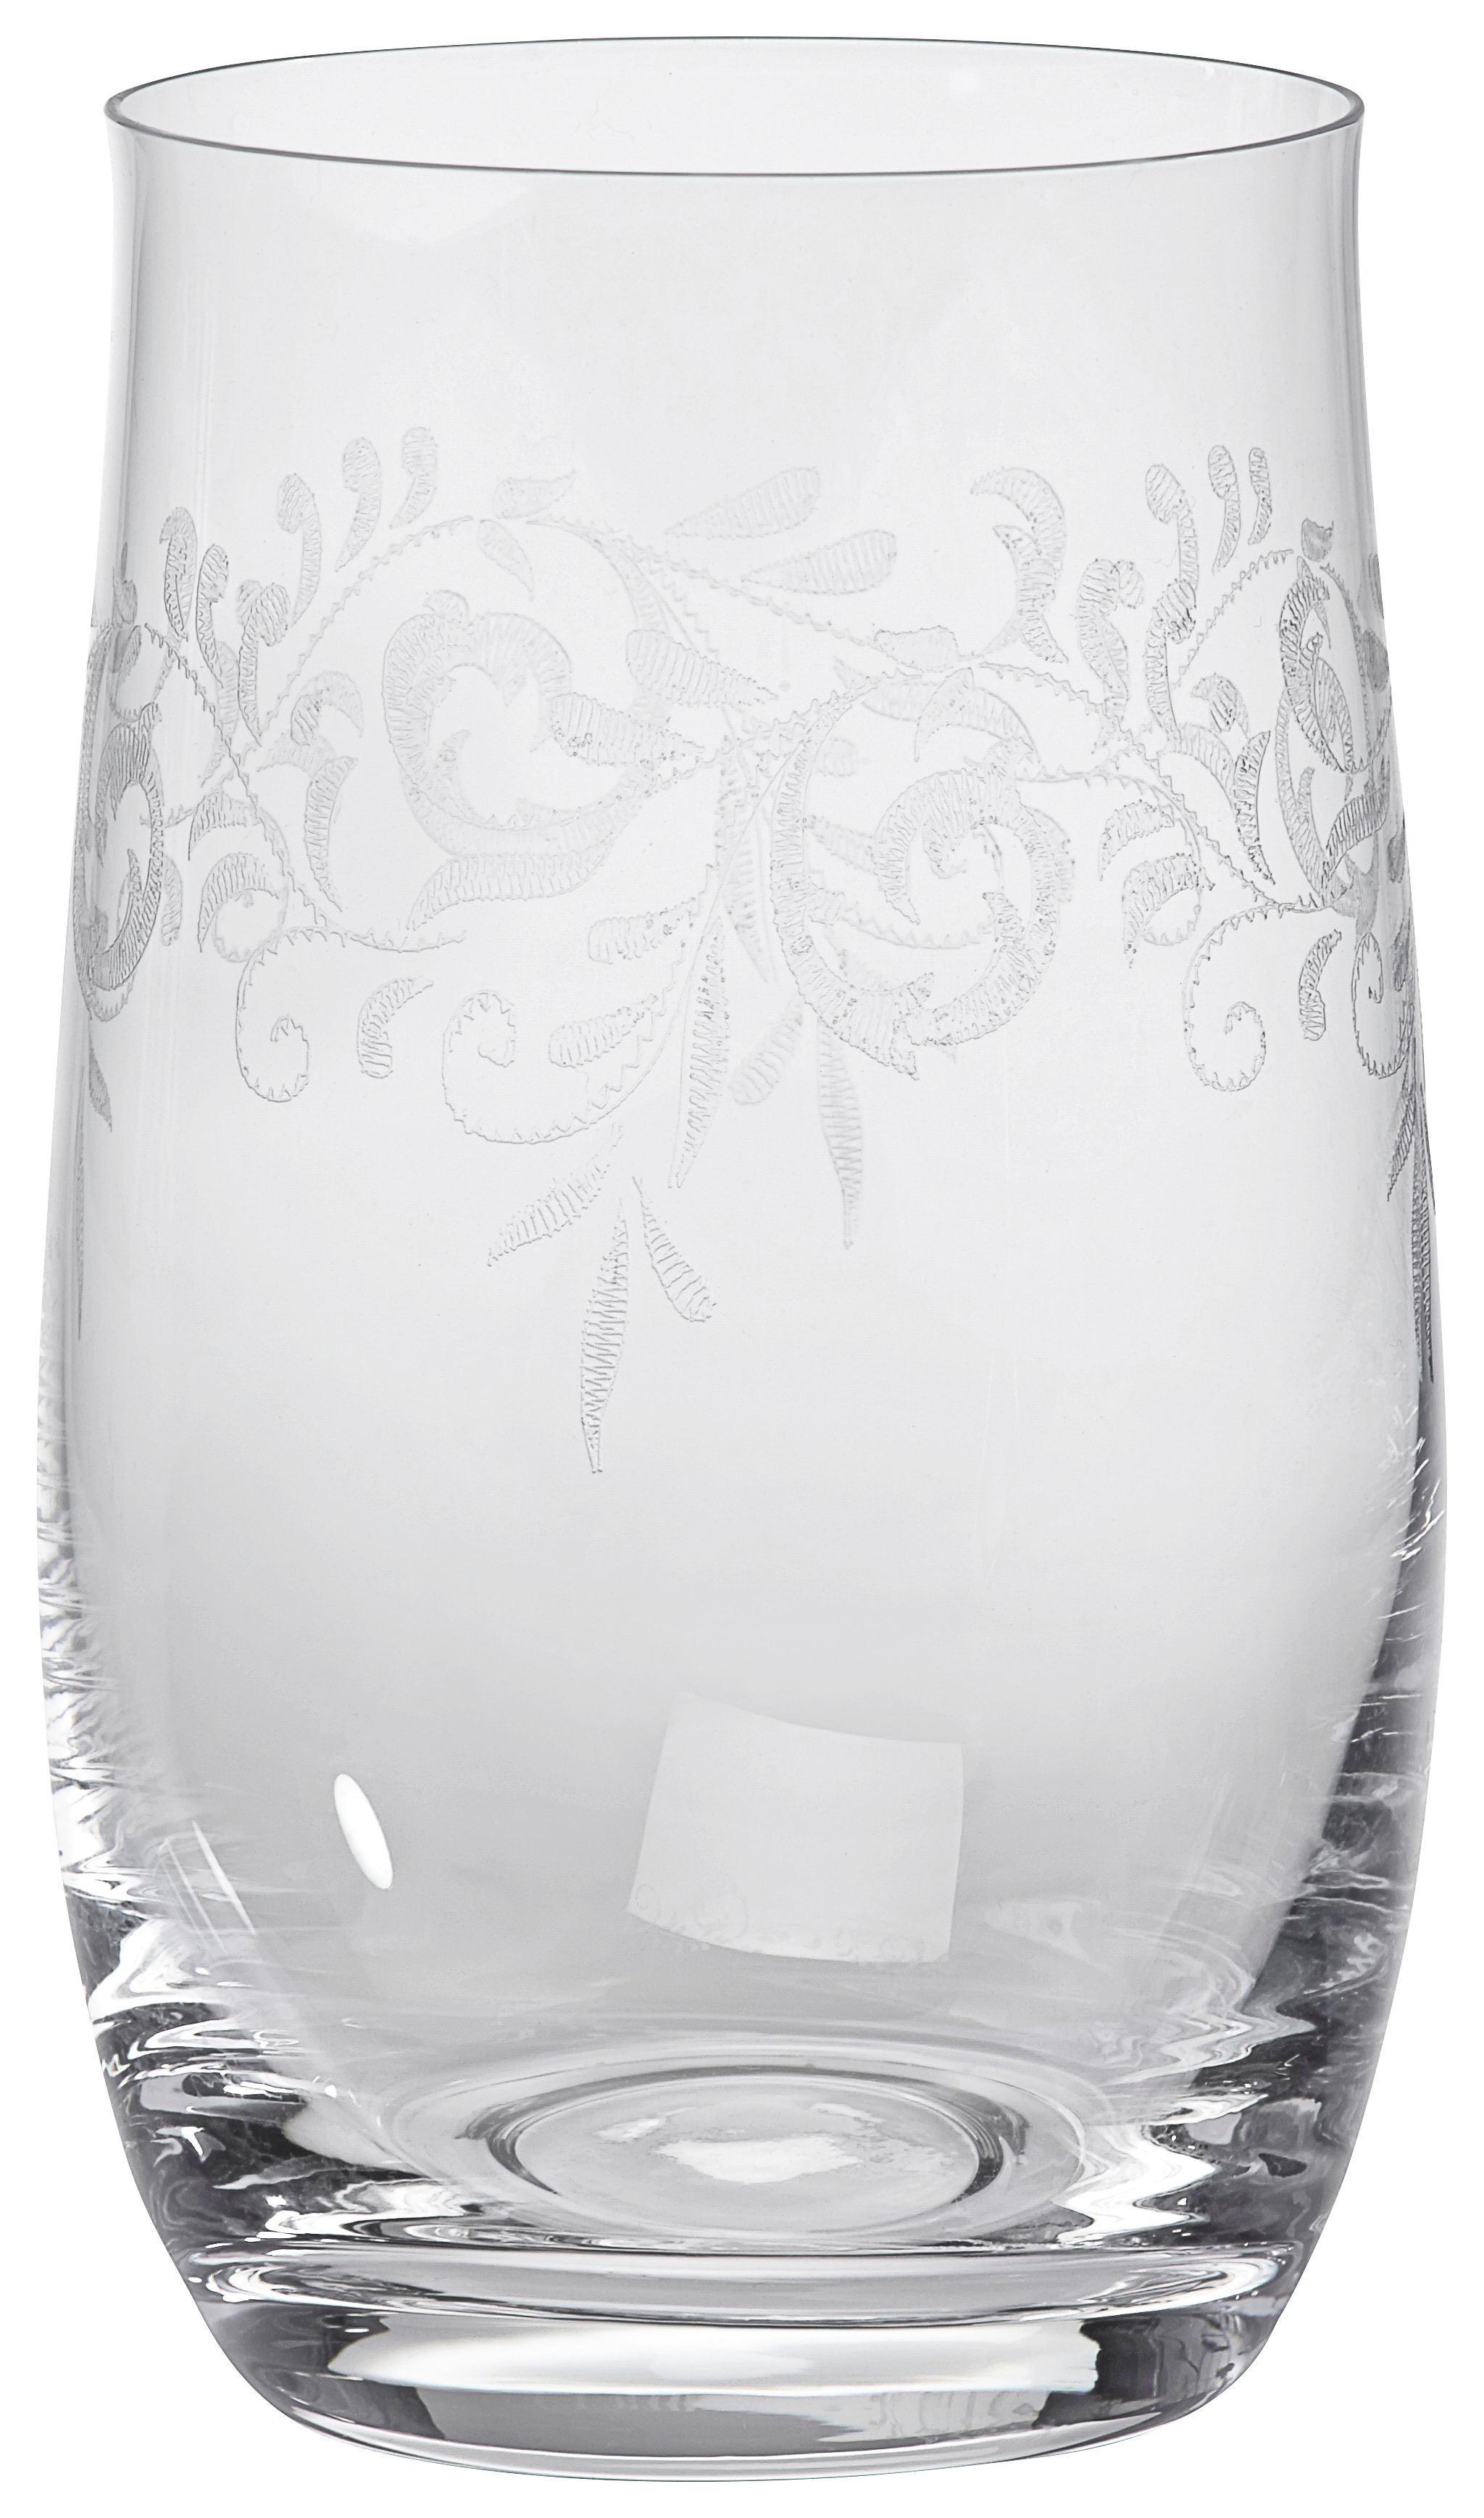 TRINKGLAS 380 ml - Klar, LIFESTYLE, Glas (0.38l) - NOVEL